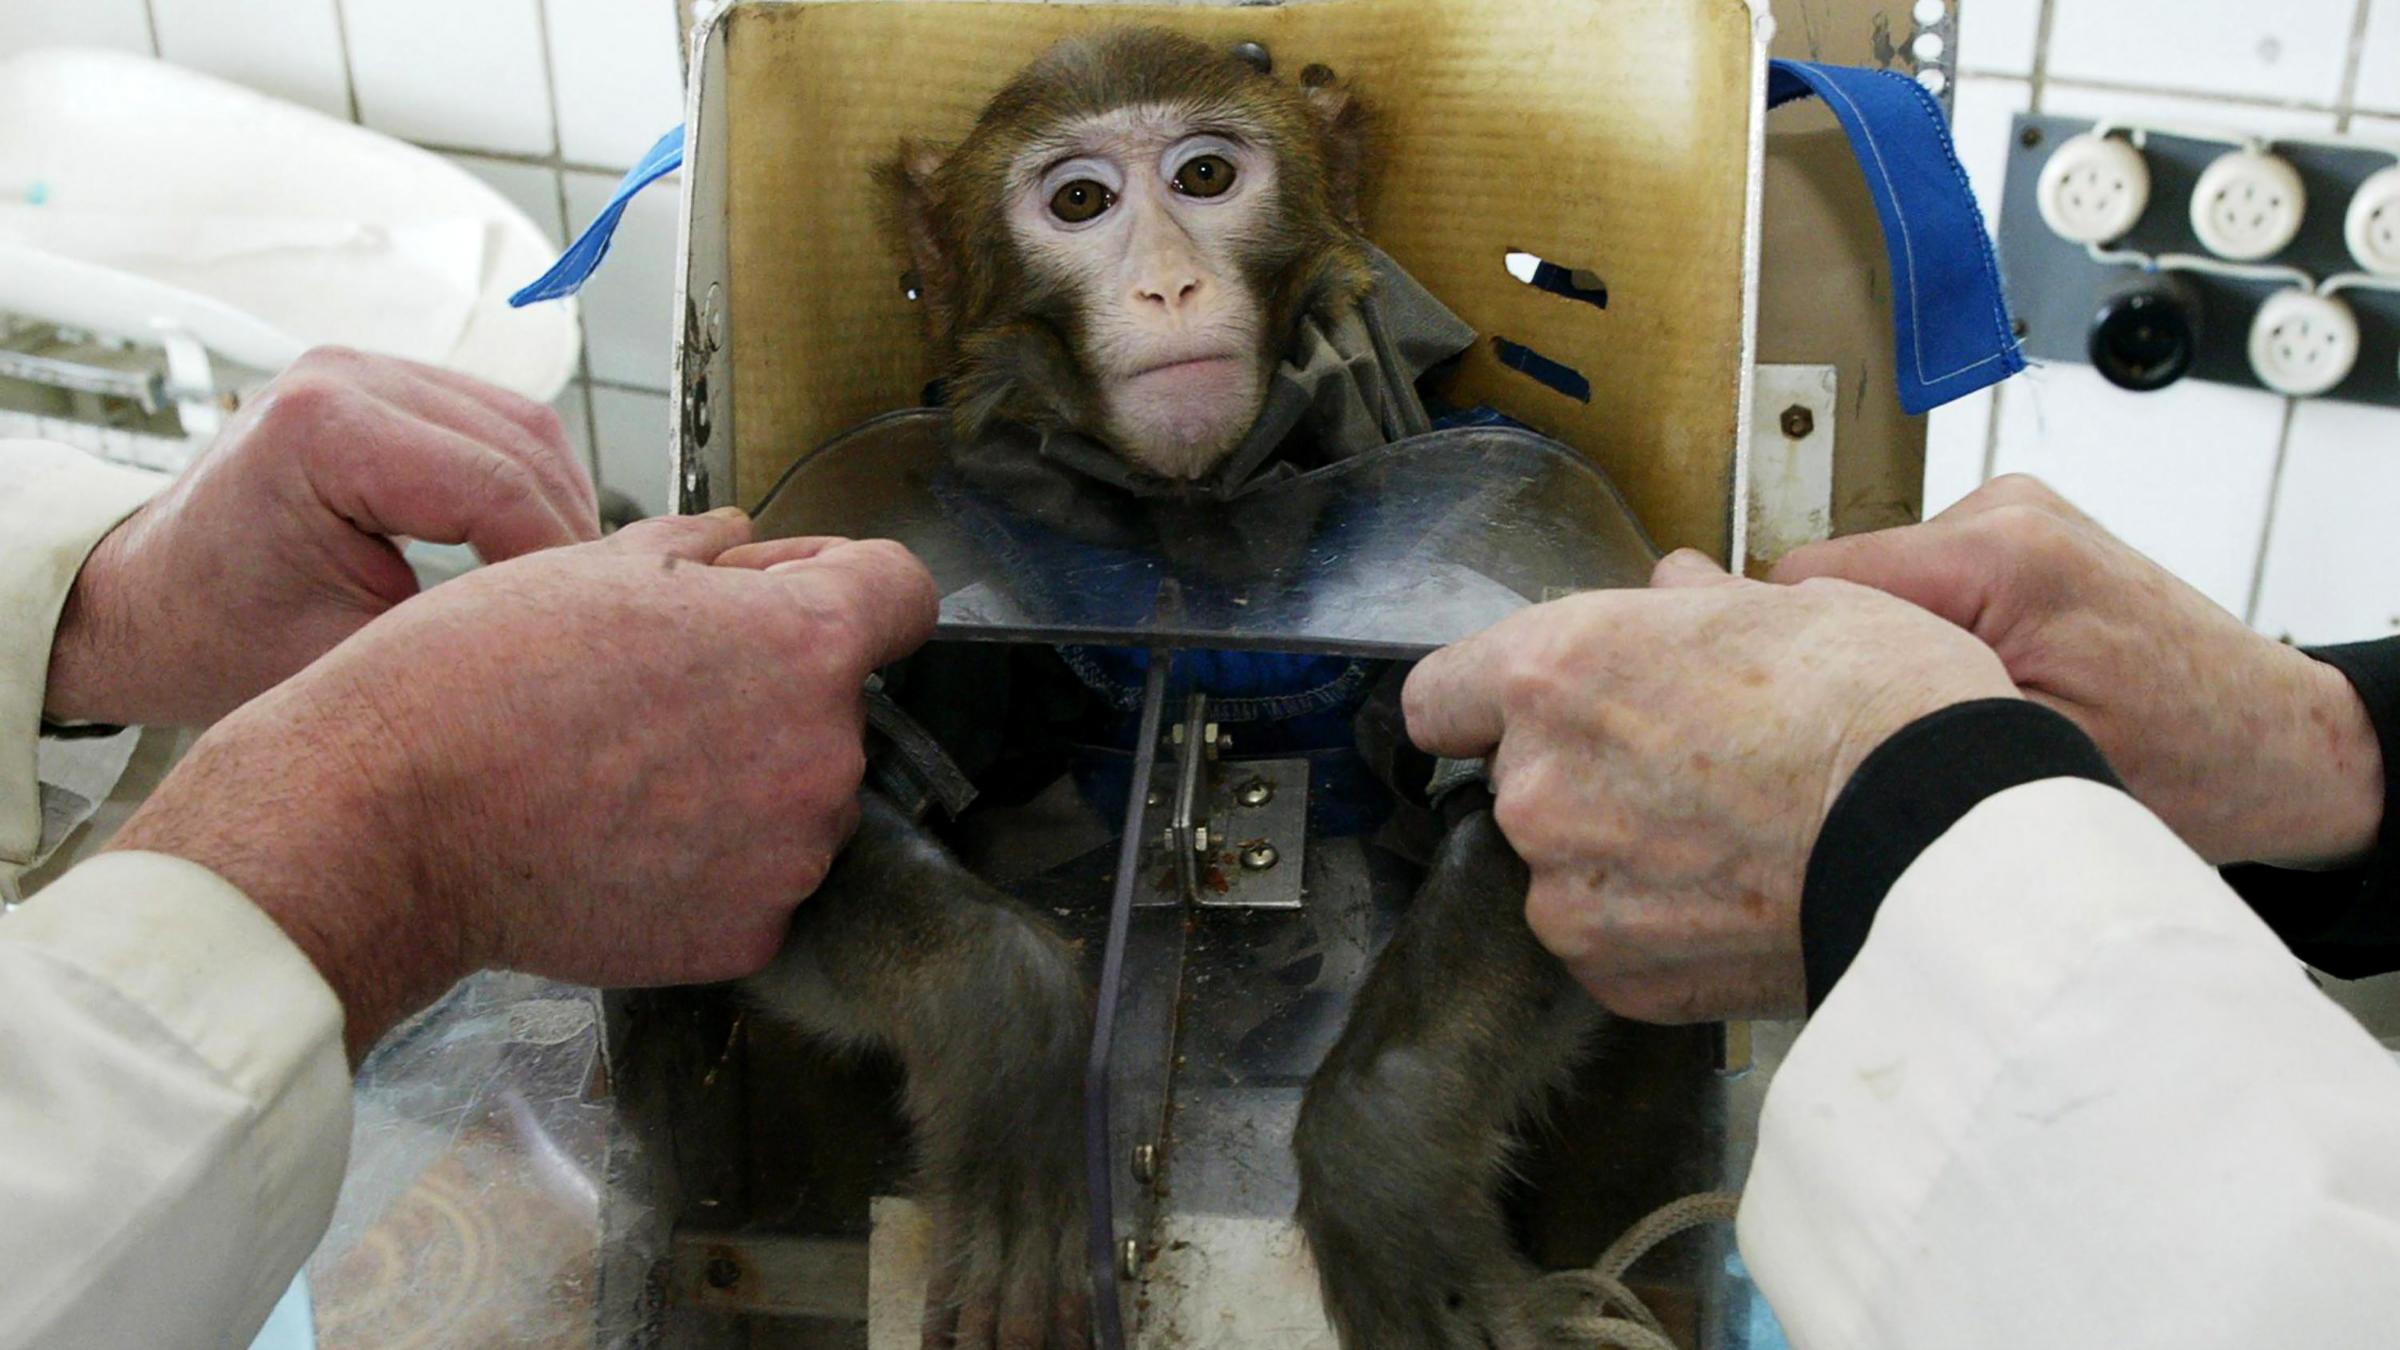 Monkey fastened to seat